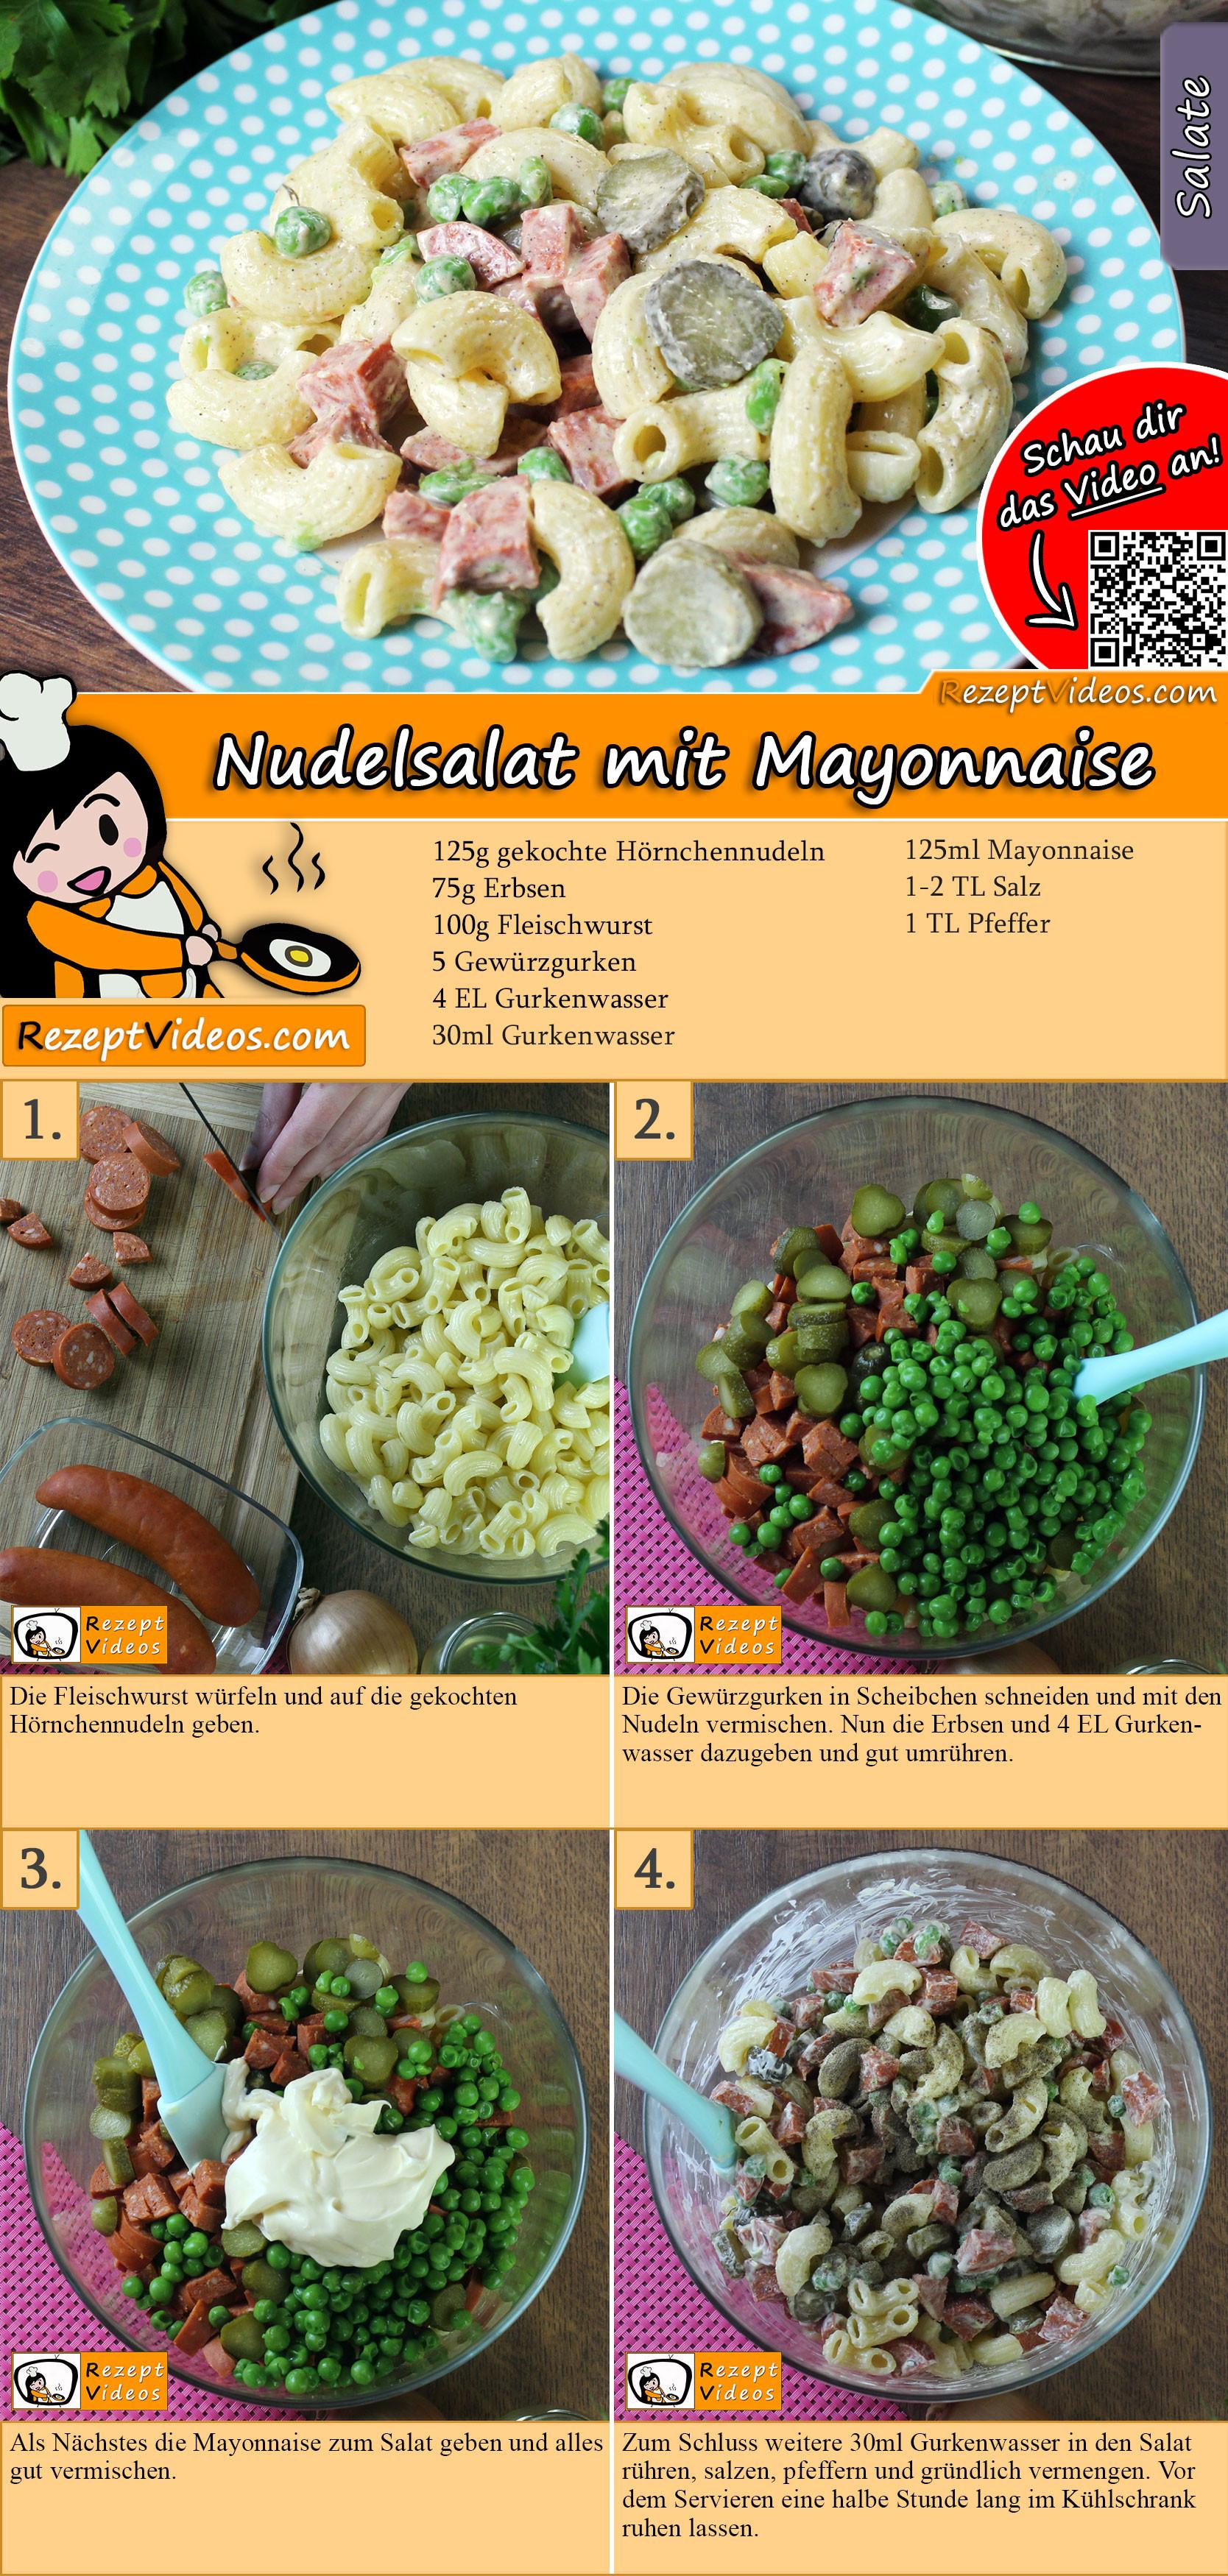 Nudelsalat mit Mayonnaise Rezept mit Video